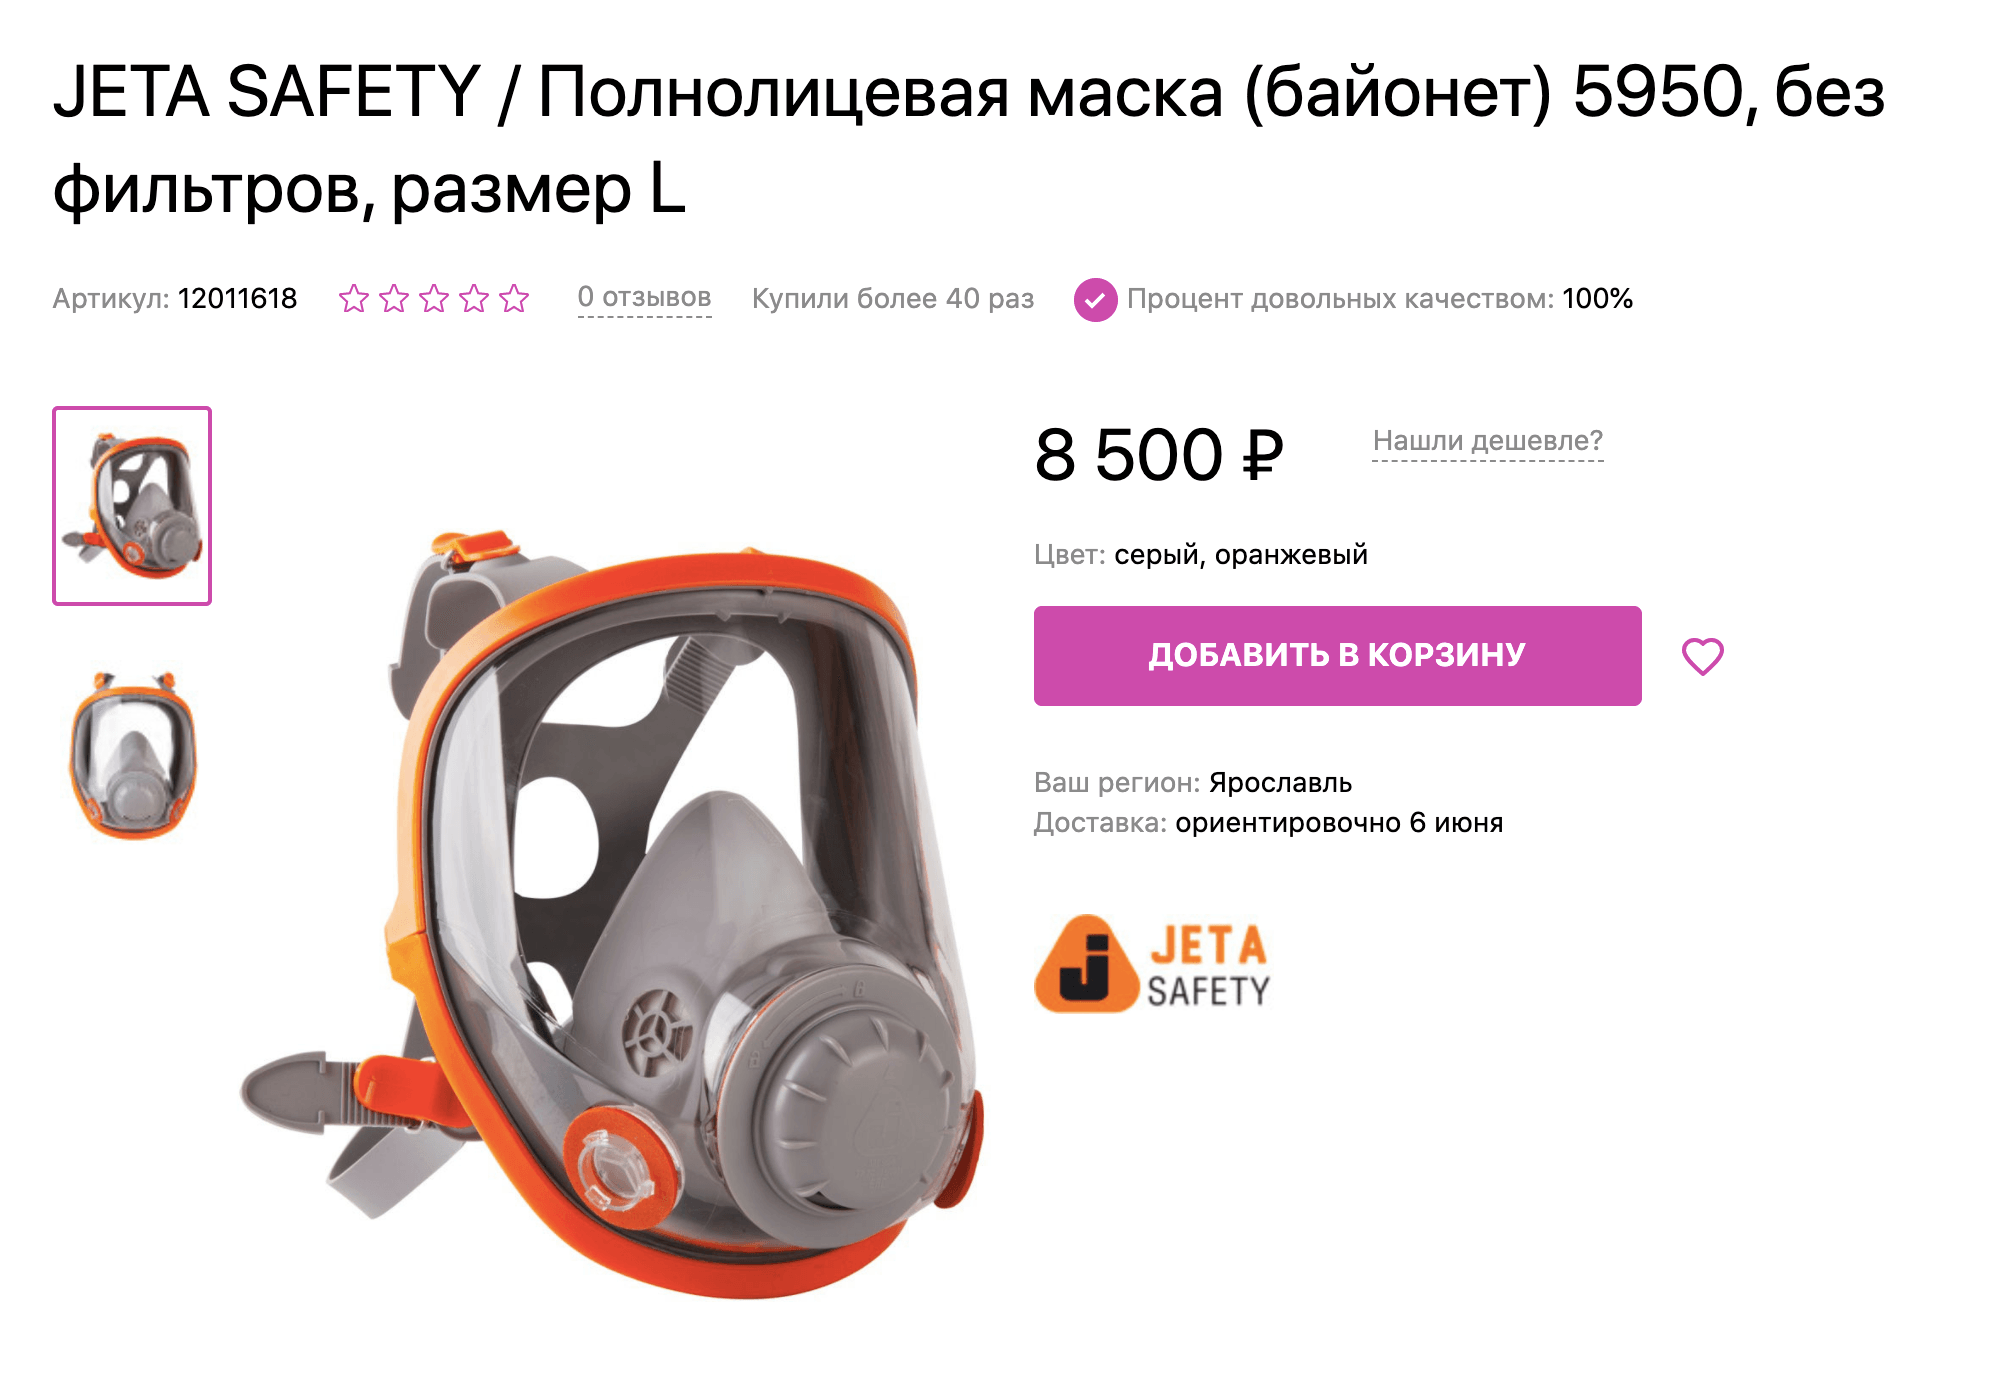 И до 8500<span class=ruble>Р</span> за брендовую модель. Но на брендовую модель лучше не тратиться